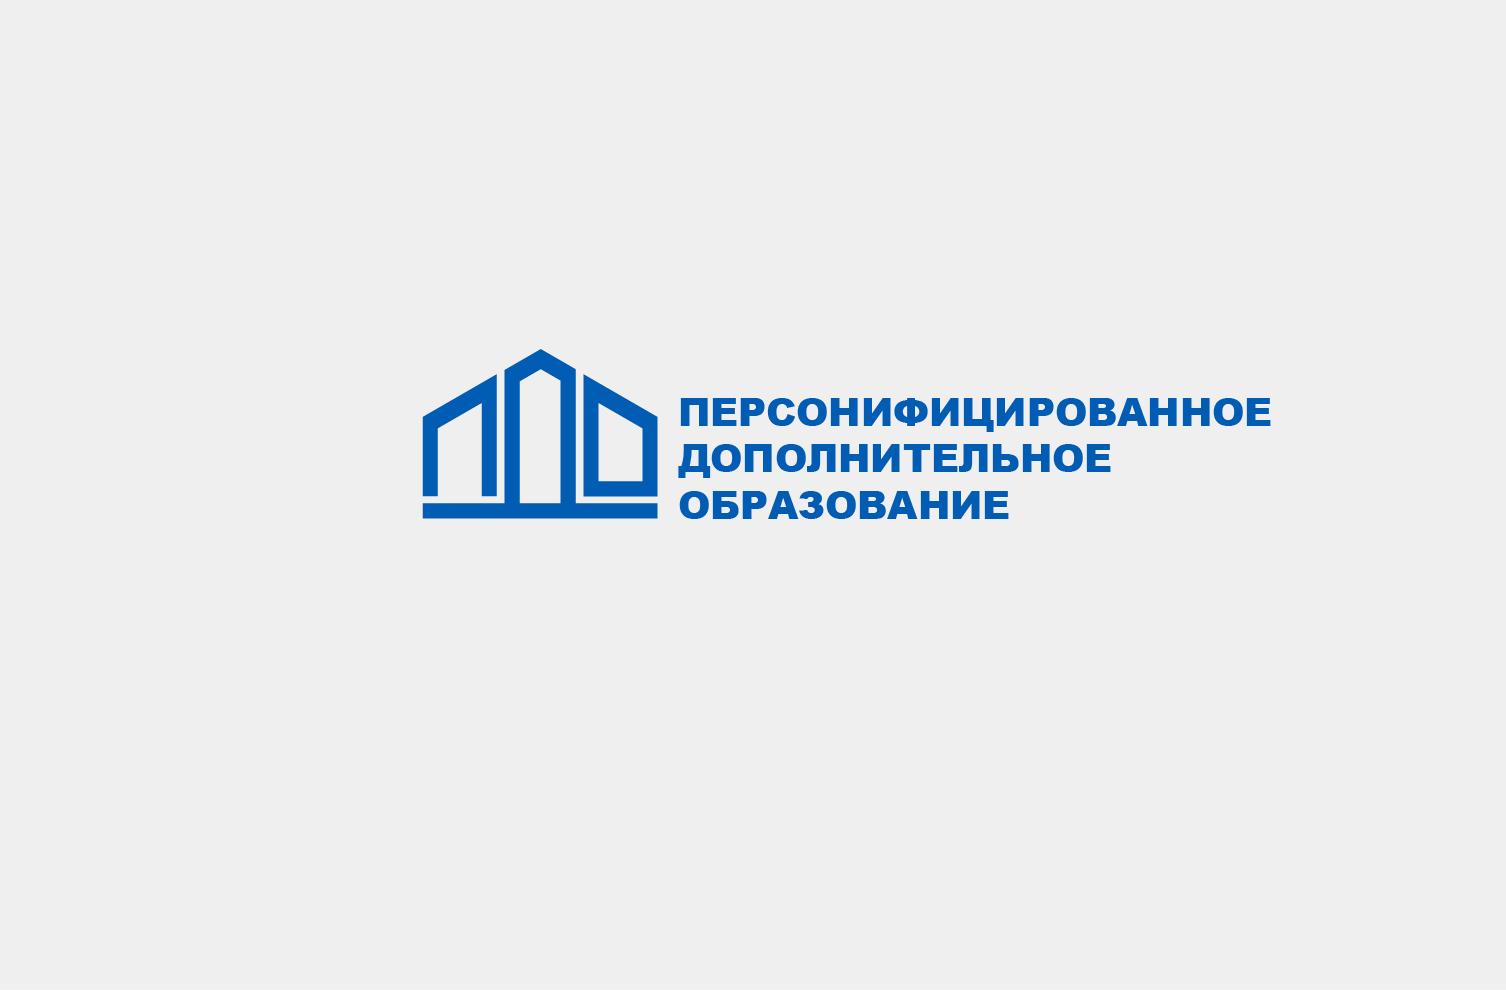 Логотип для интернет-портала фото f_6285a43f0378792c.jpg